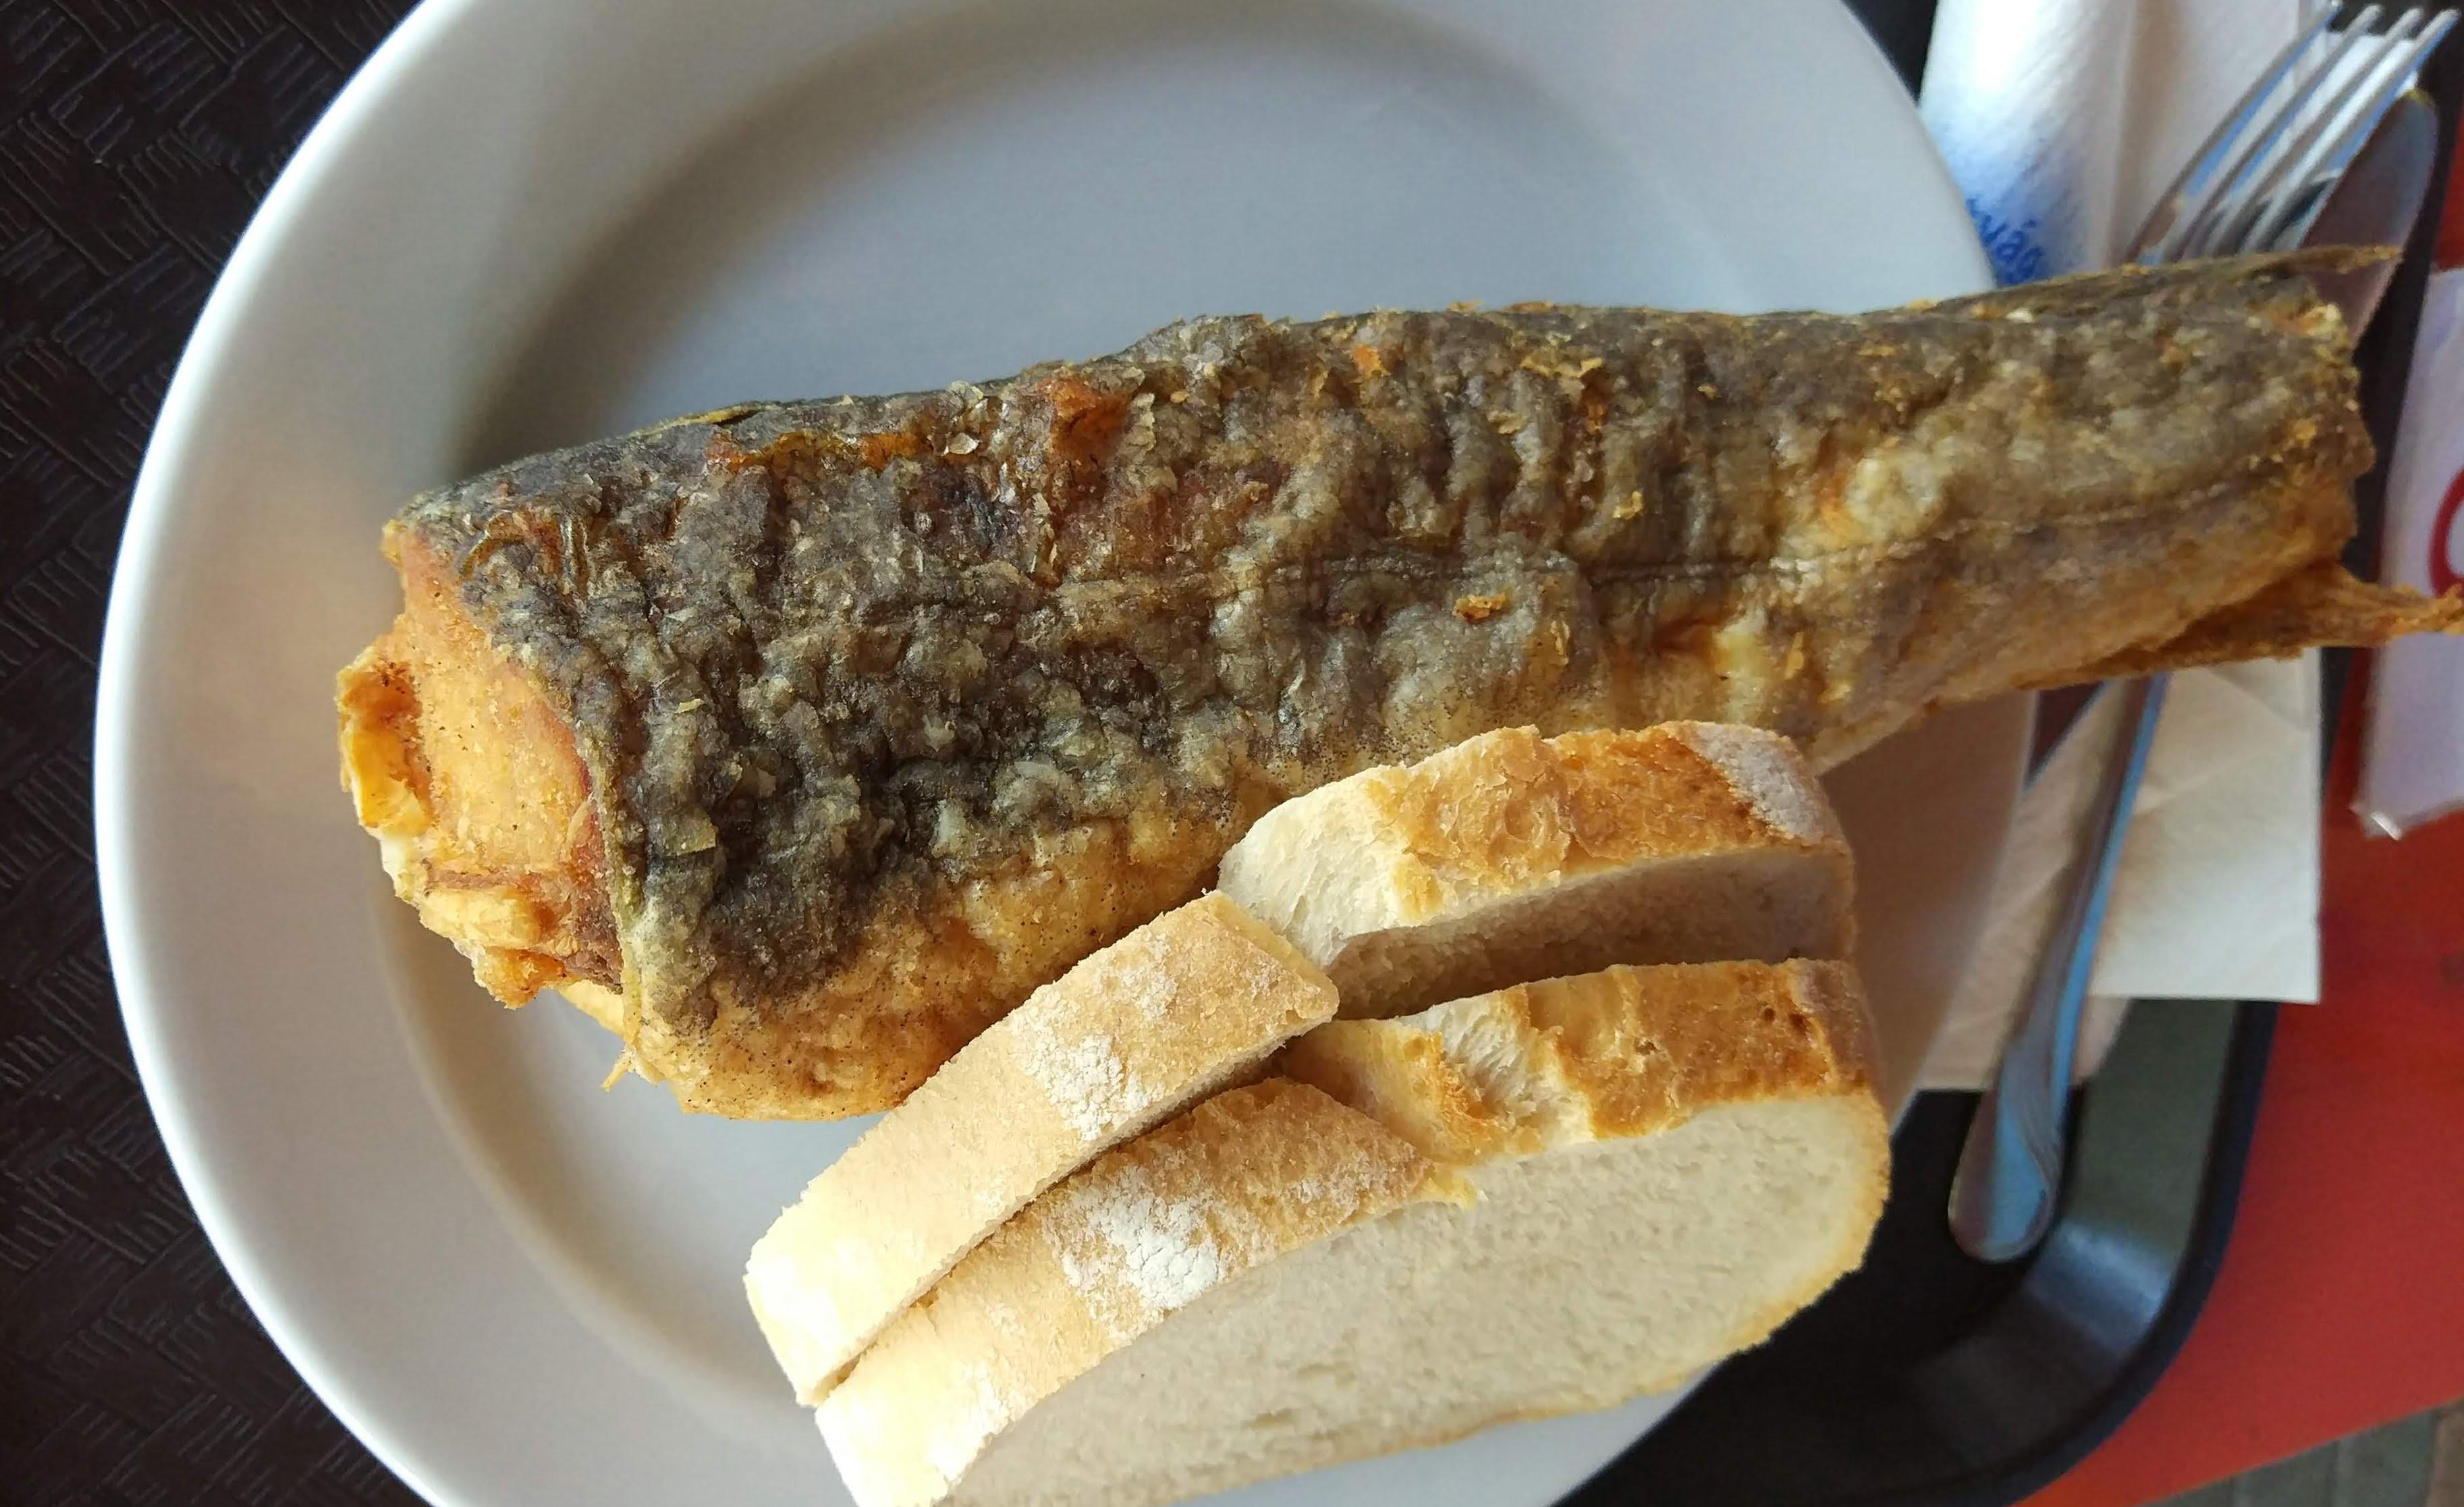 The Hungarian fish